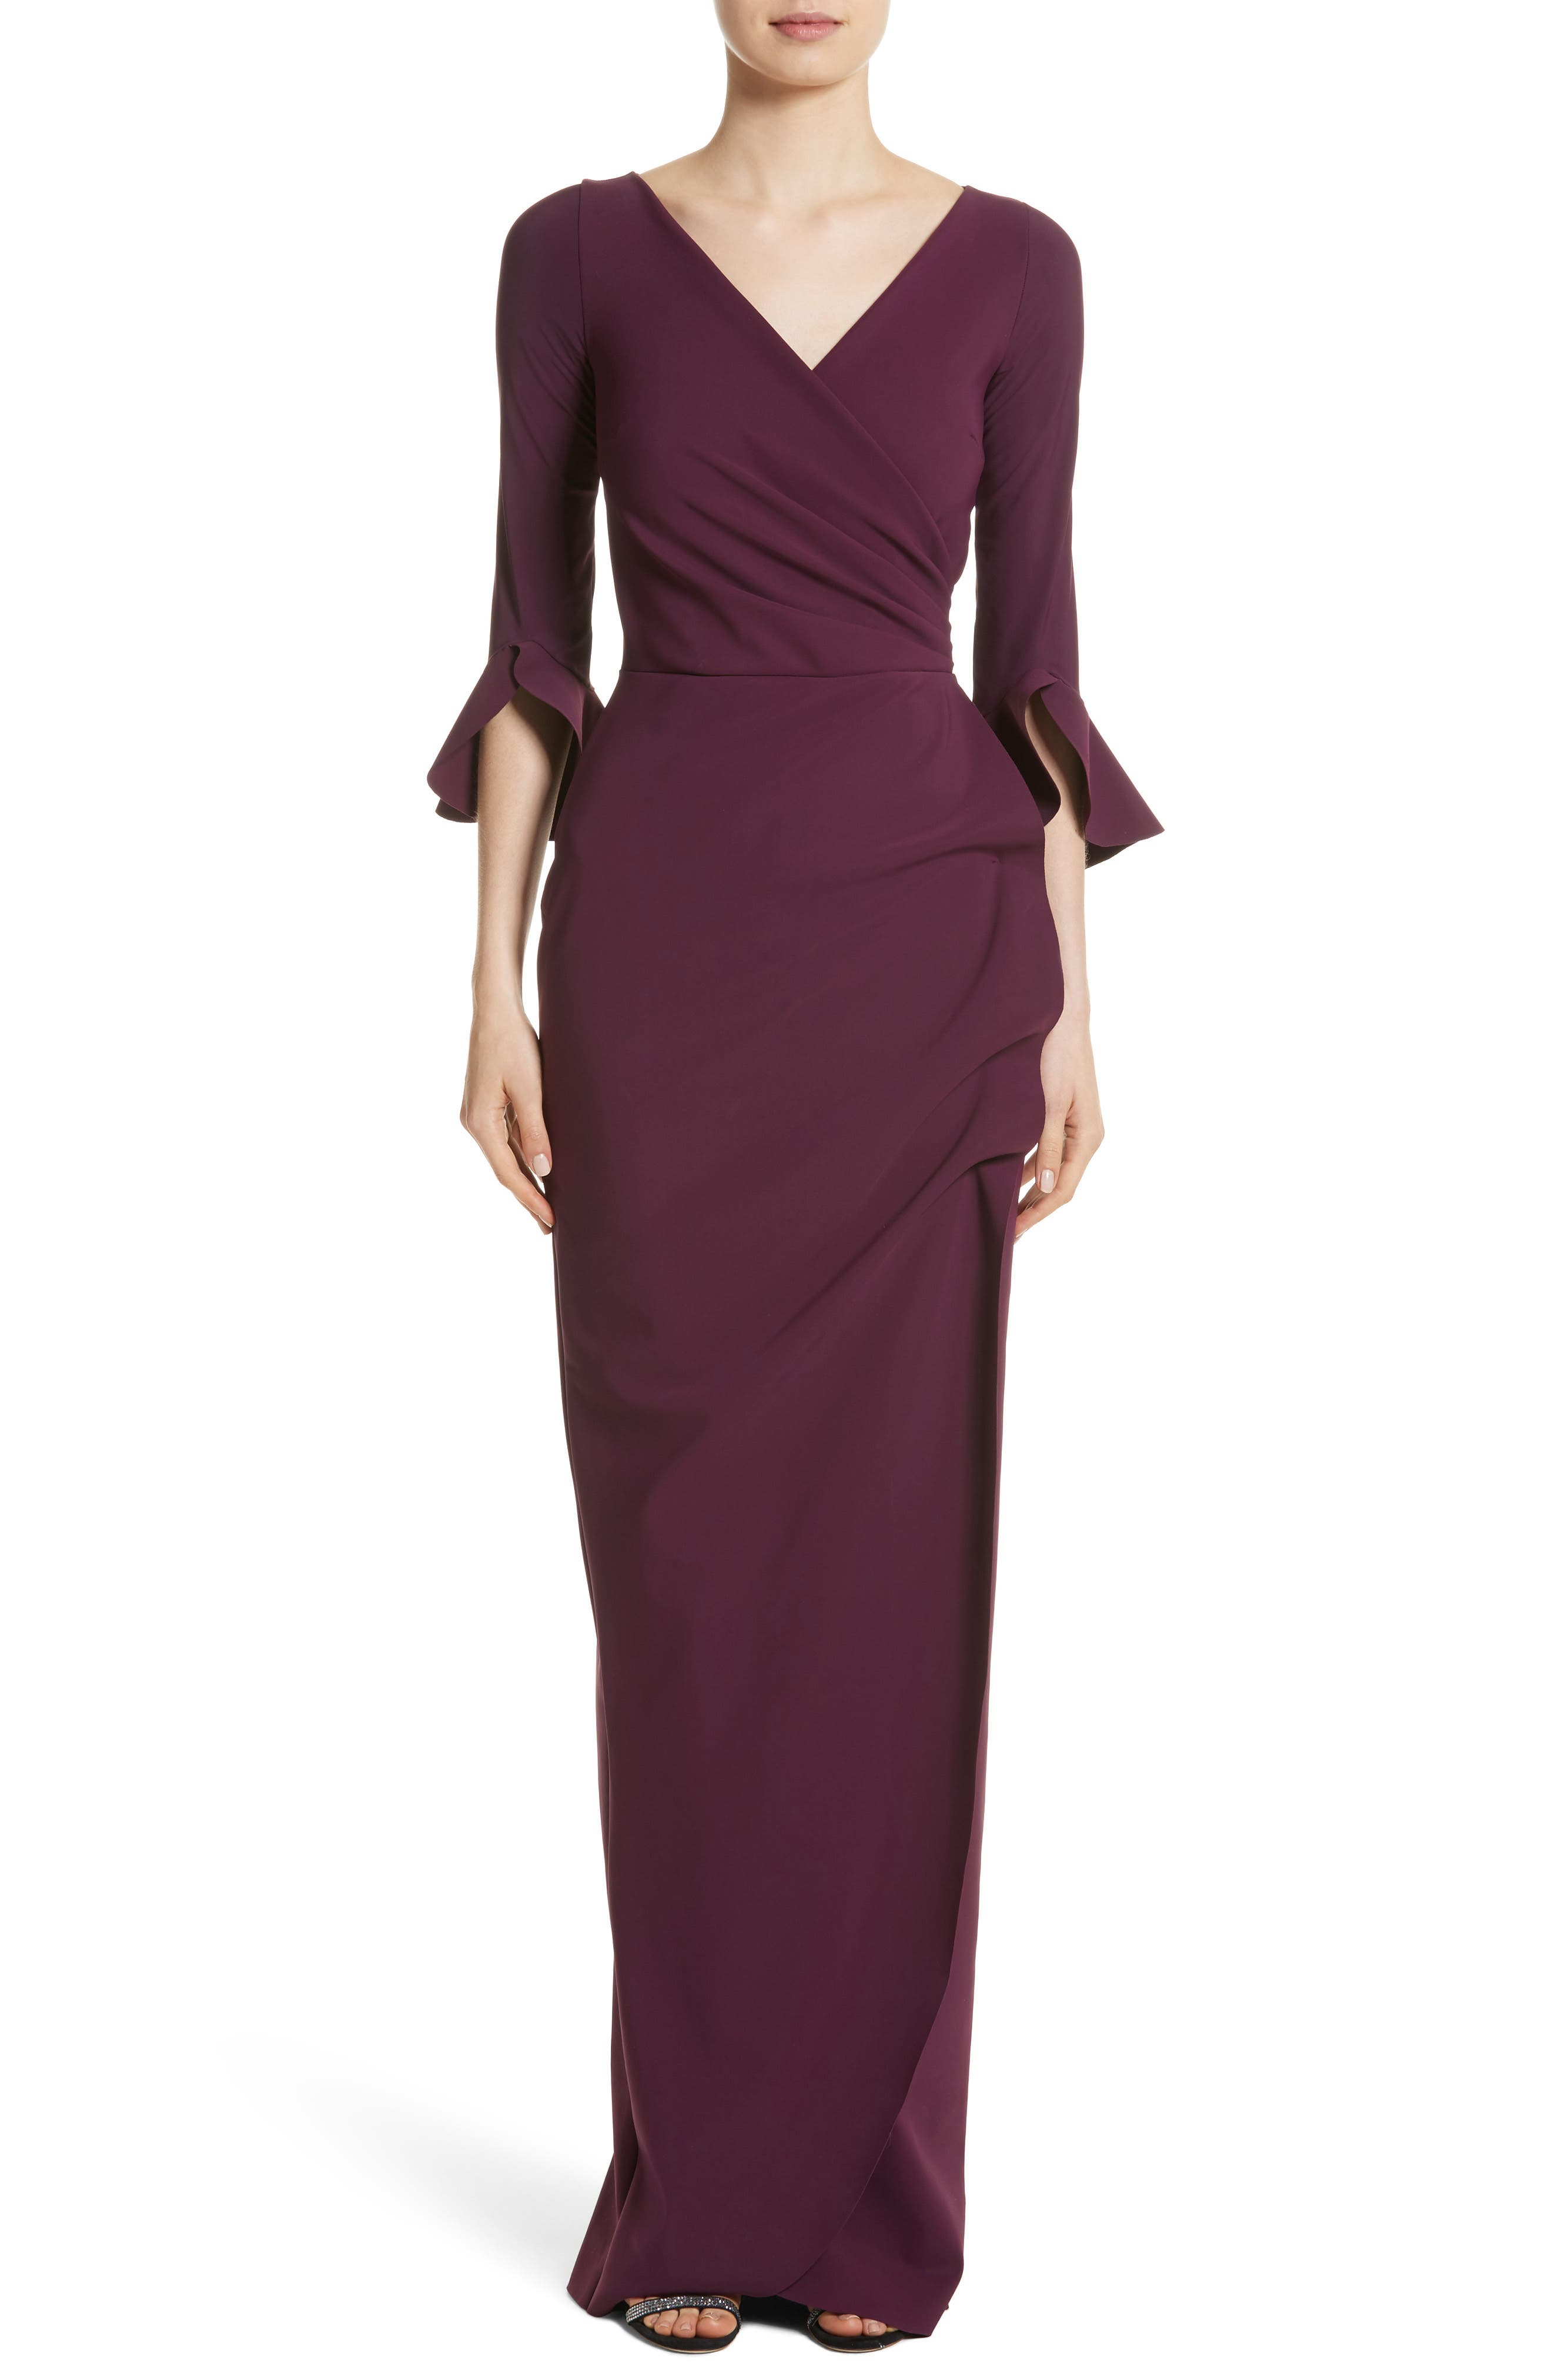 Alternate Image 1 Selected - Chiara Boni La Petite Robe Ruffle Cuff Side Drape Gown